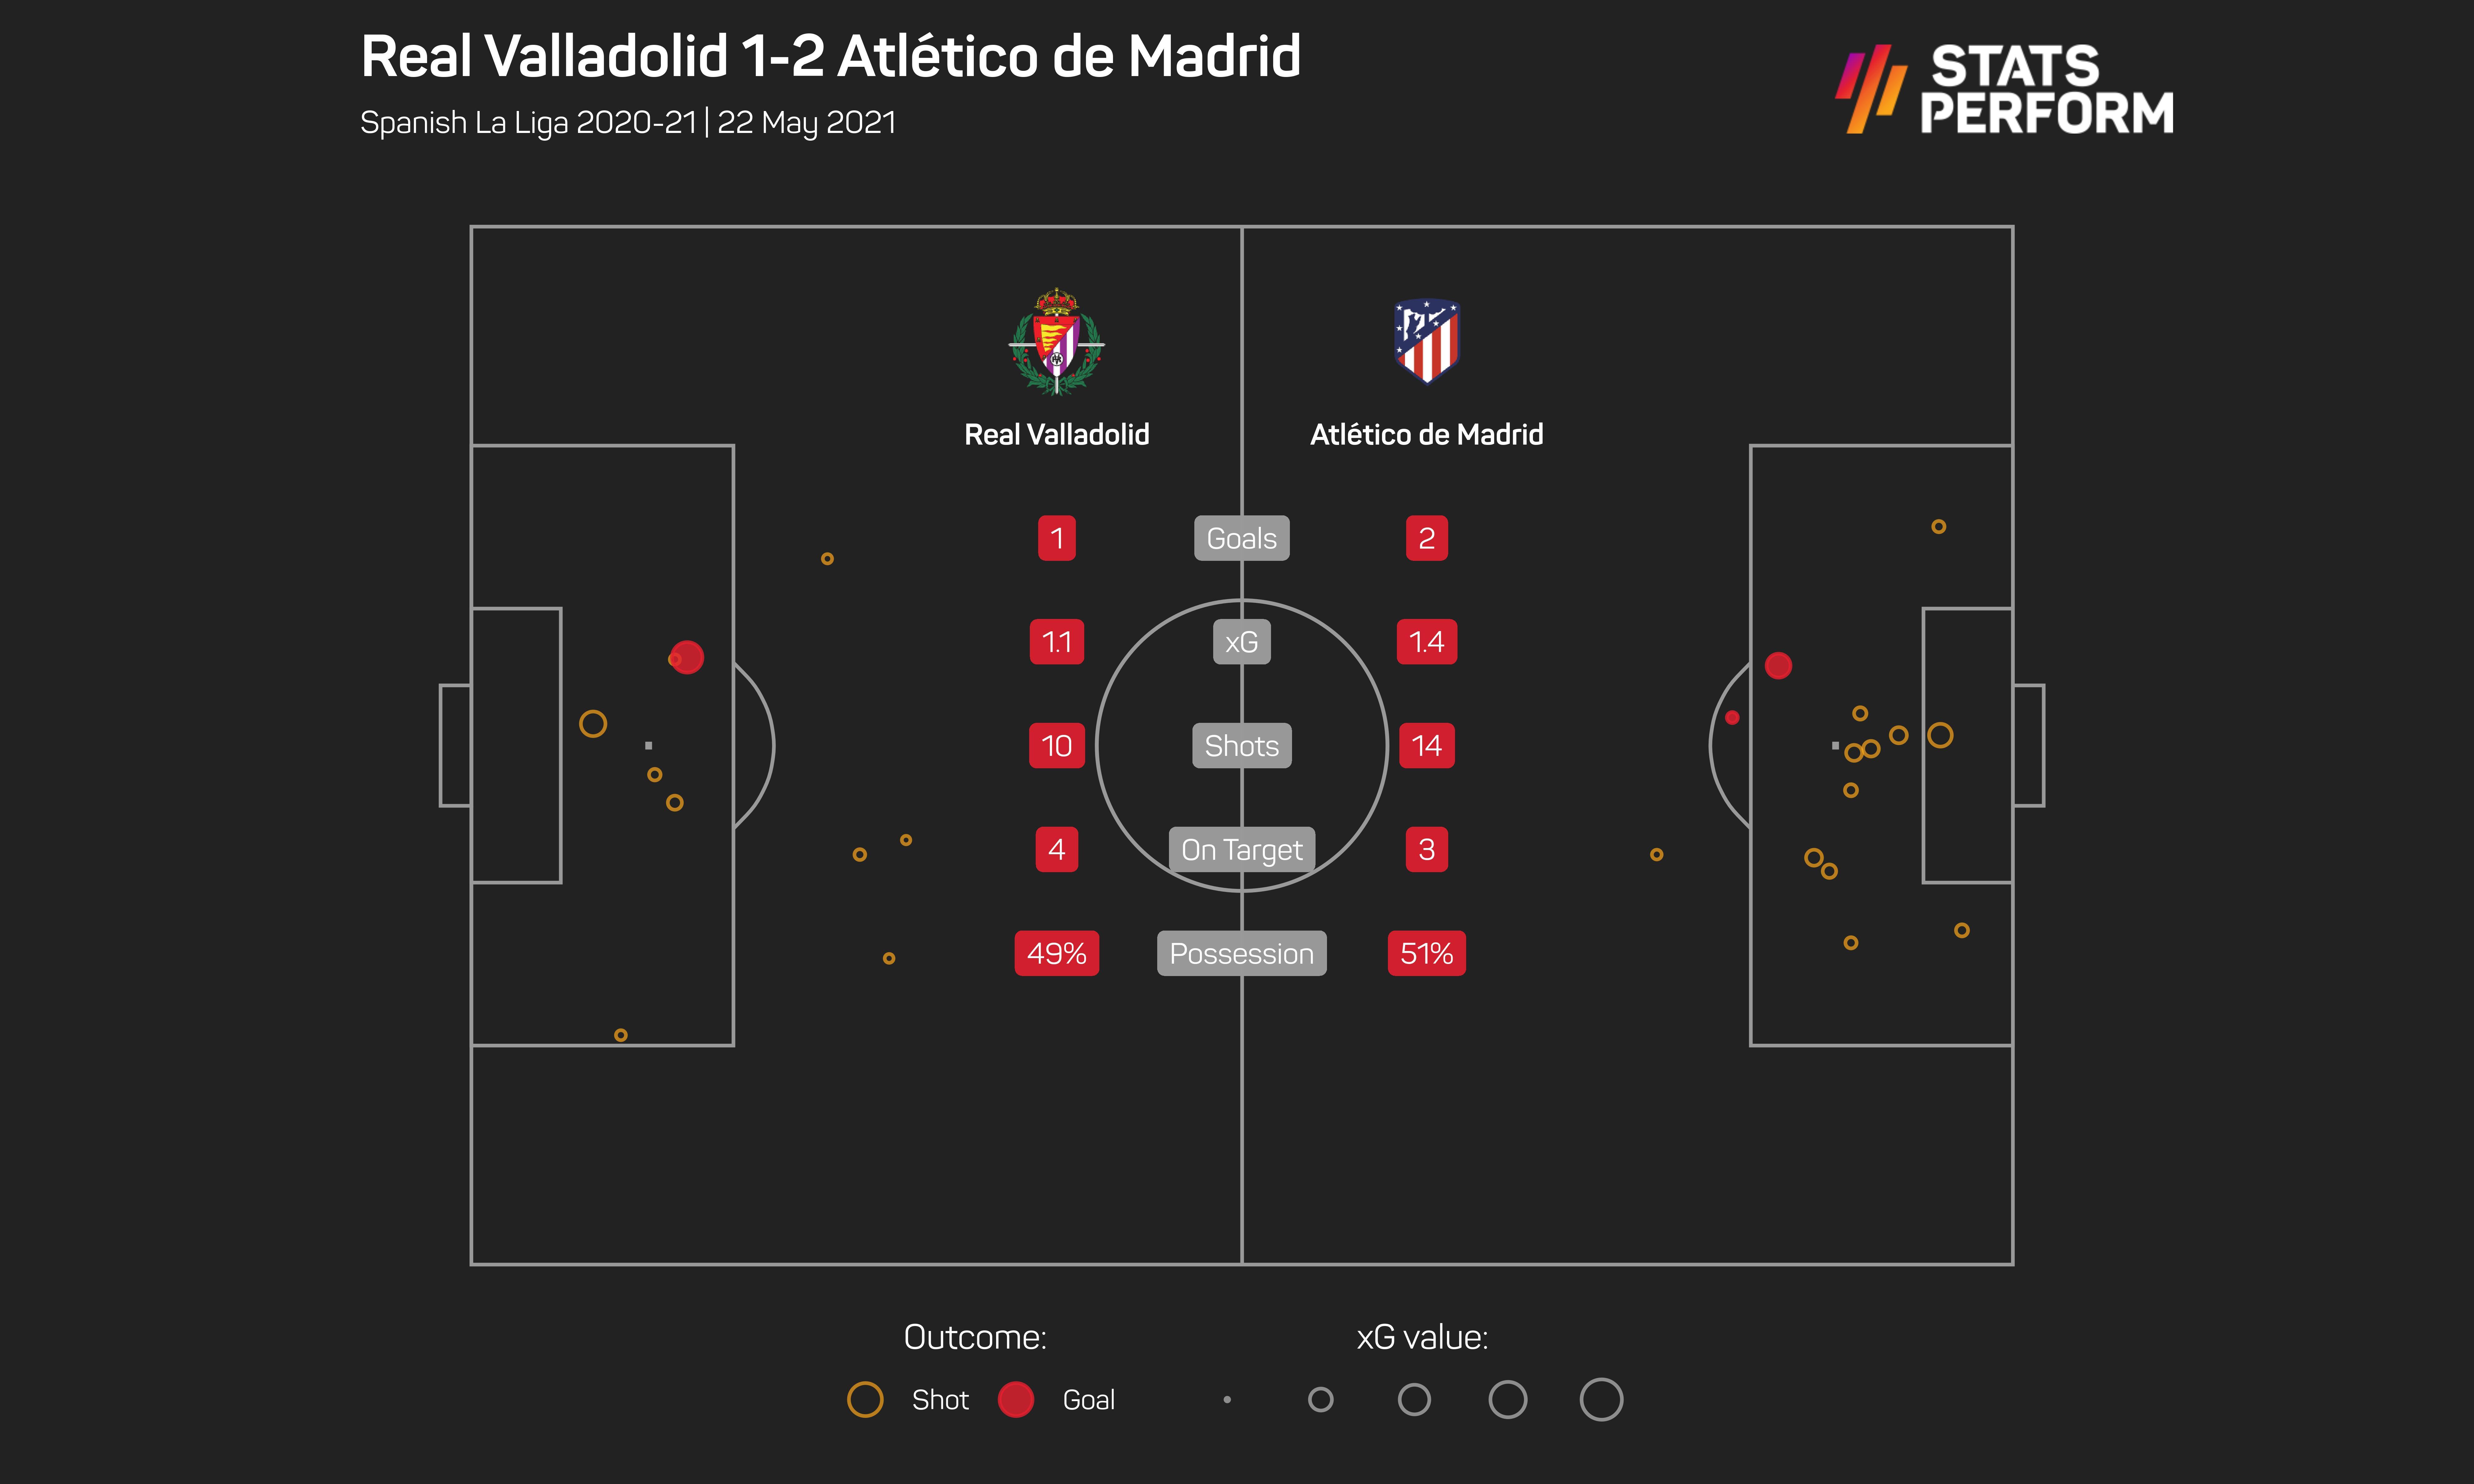 Real Valladolid v Atletico Madrid May 2021 match stats